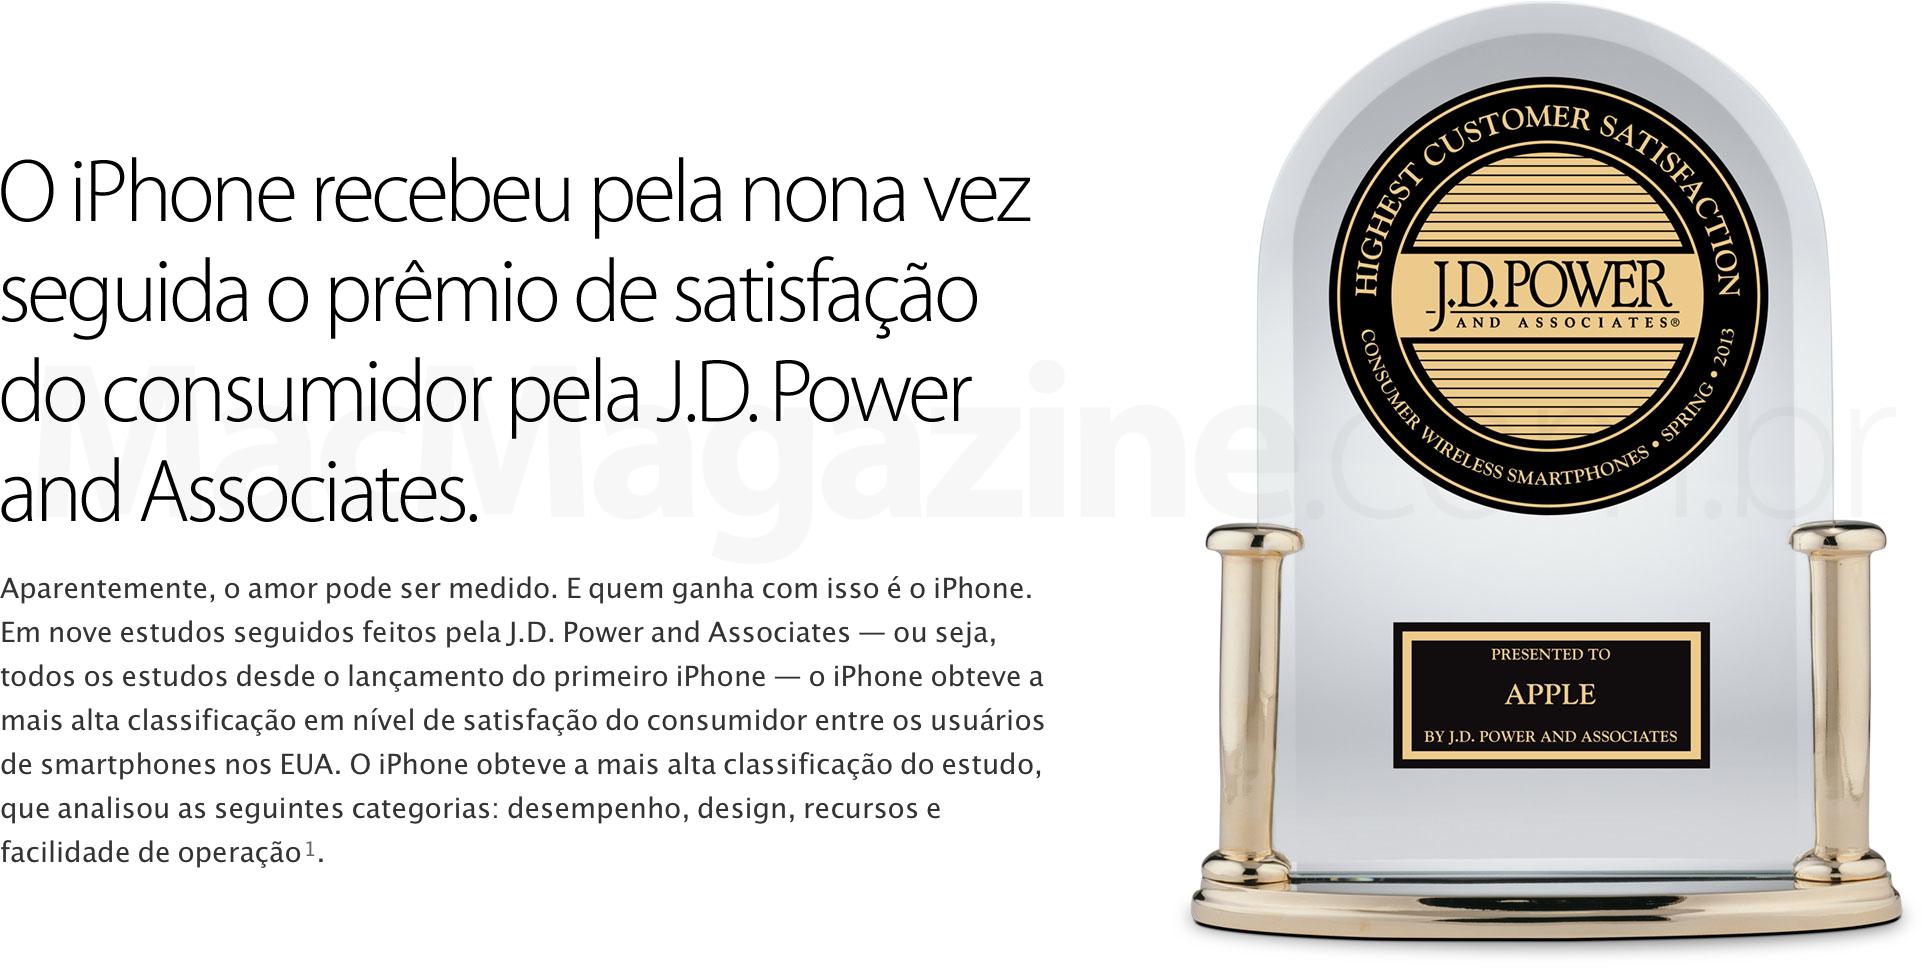 iPhone - J.D. Power and Associates